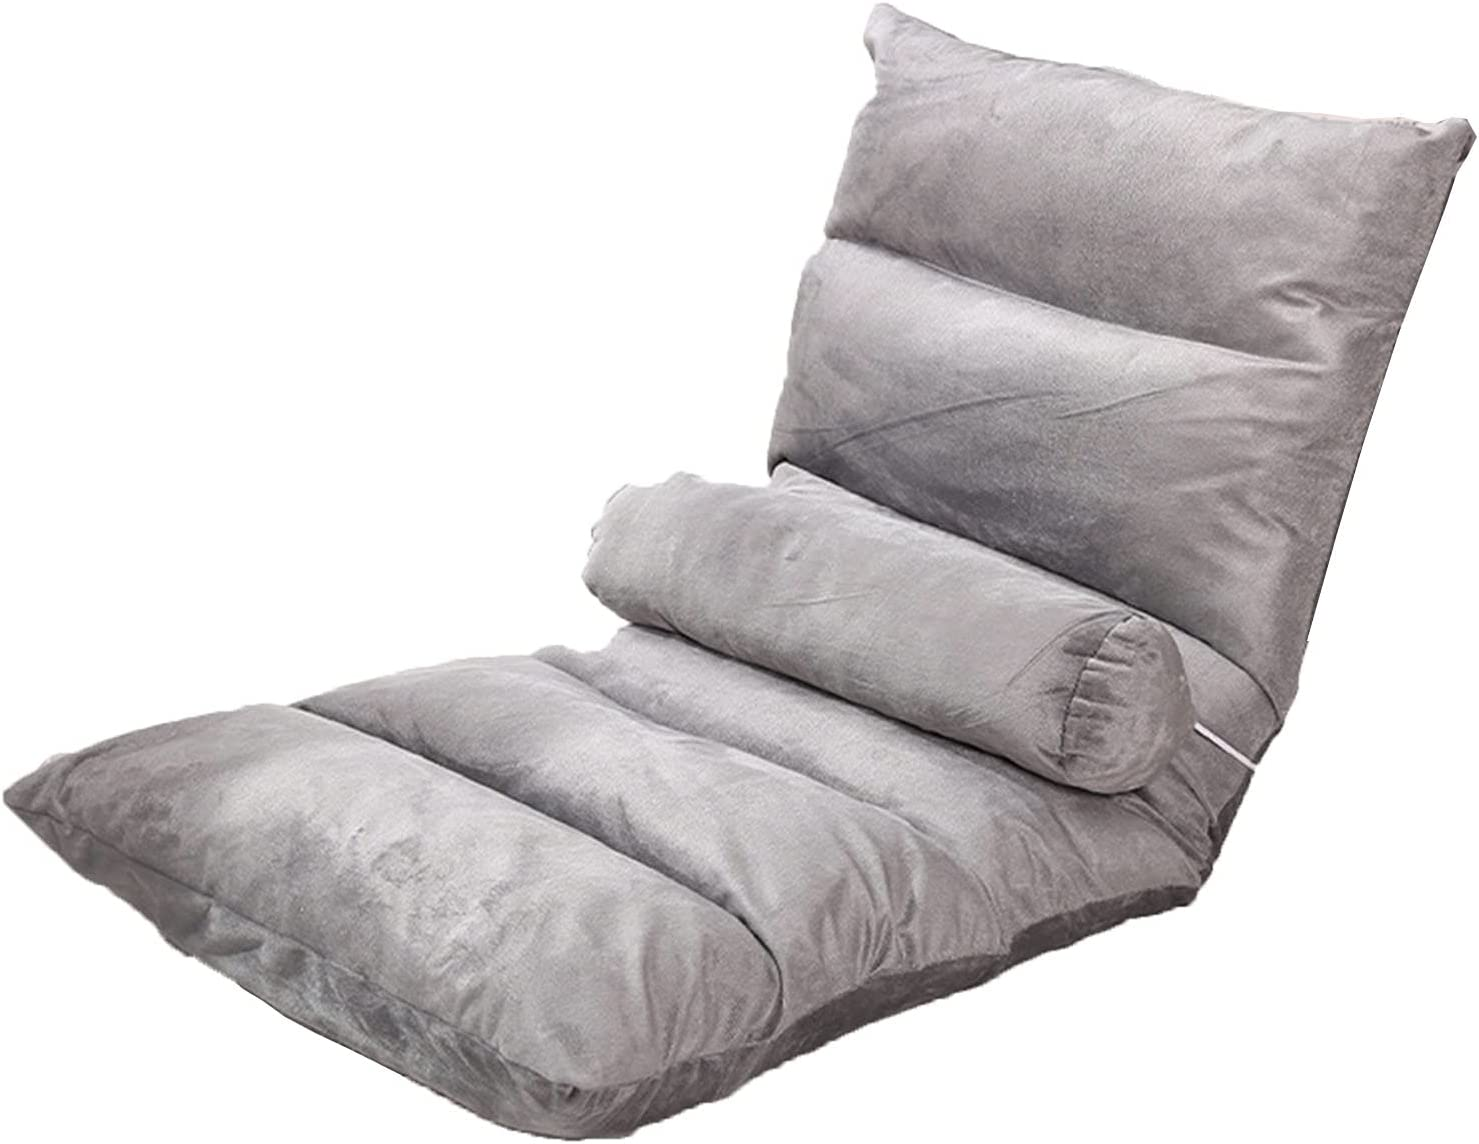 LHQ-HQ 6 Grid Dark Direct sale of Ranking TOP4 manufacturer Gray Lazy Recliner Sofa Folding Chair